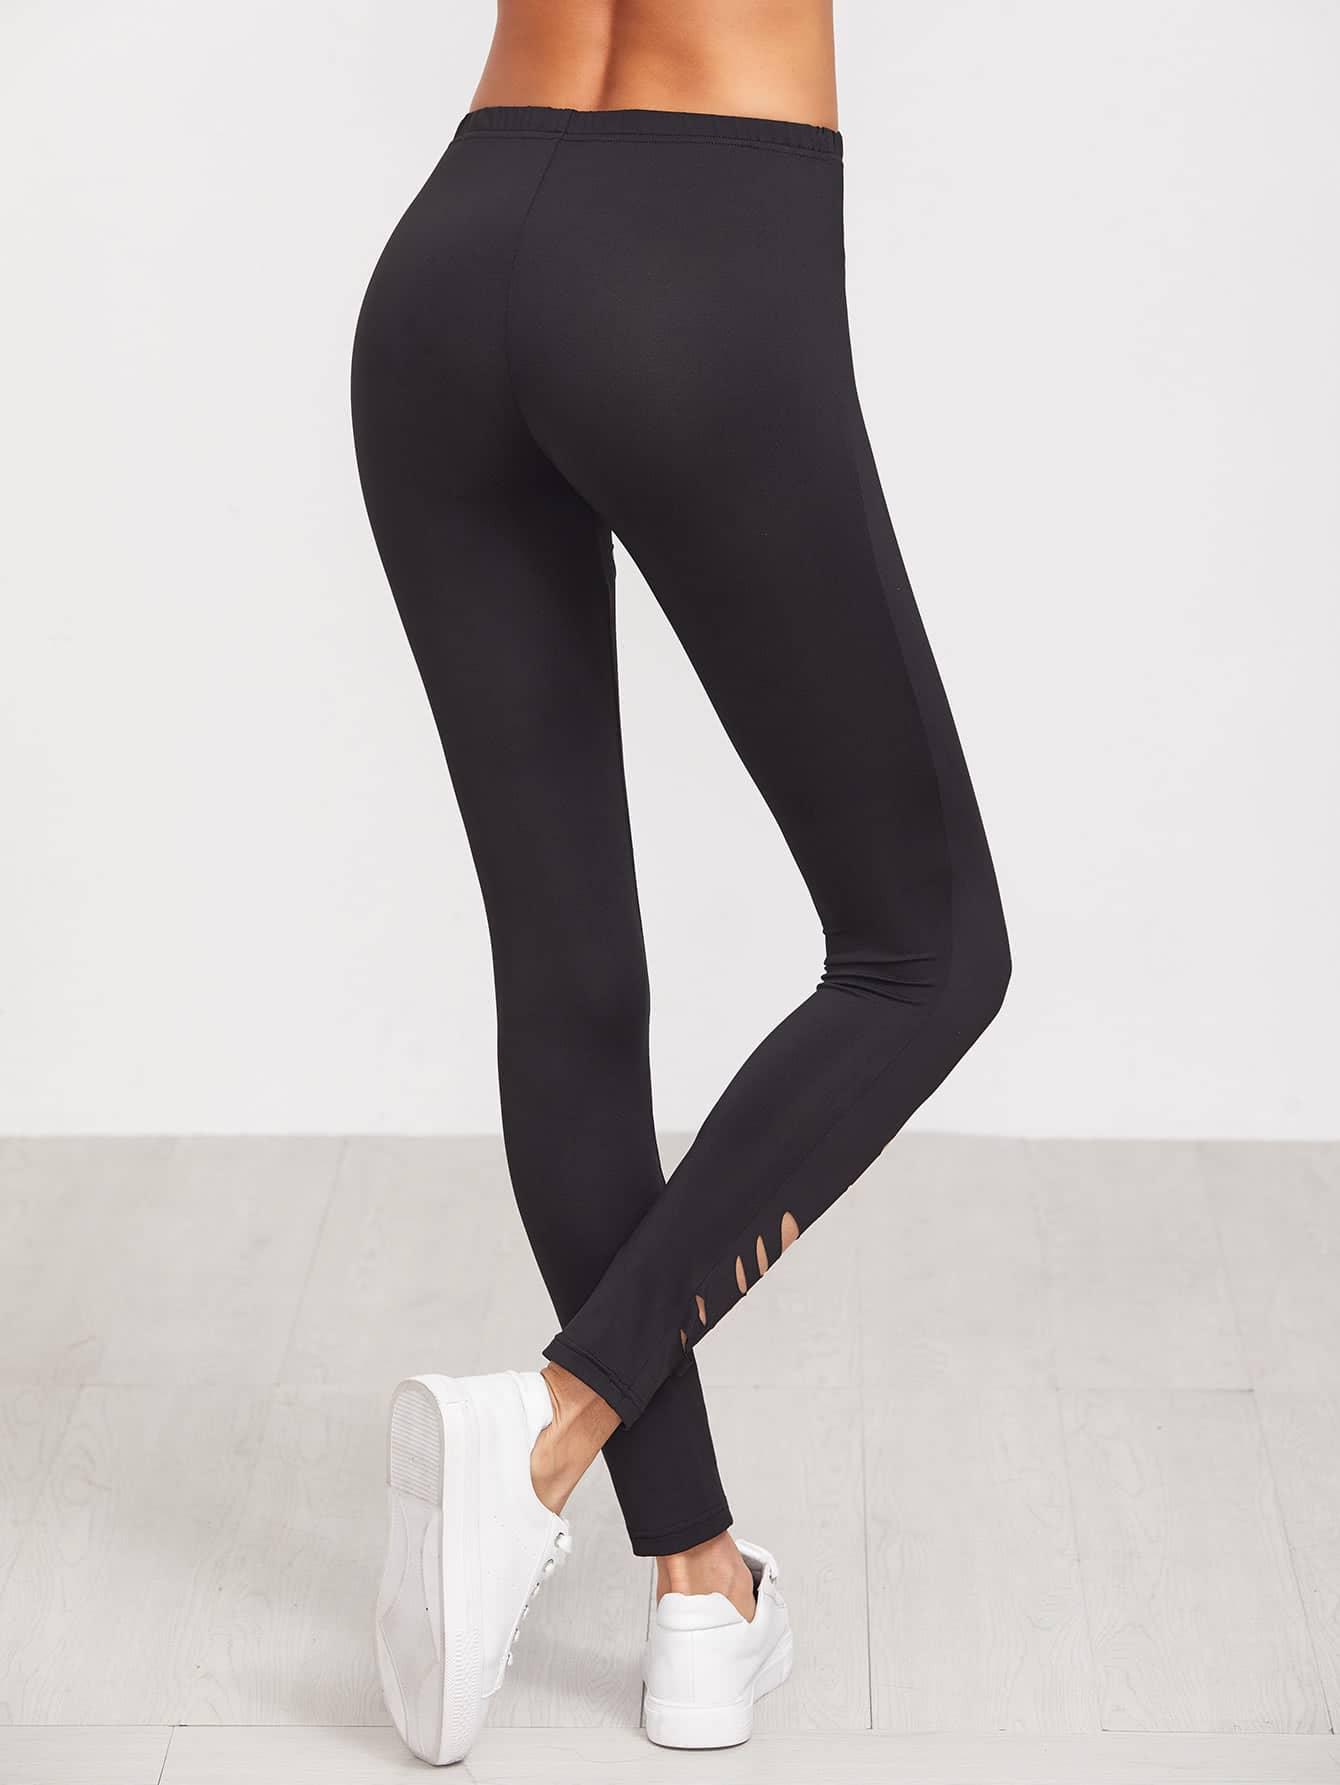 pantalon noir avec trou french shein sheinside. Black Bedroom Furniture Sets. Home Design Ideas